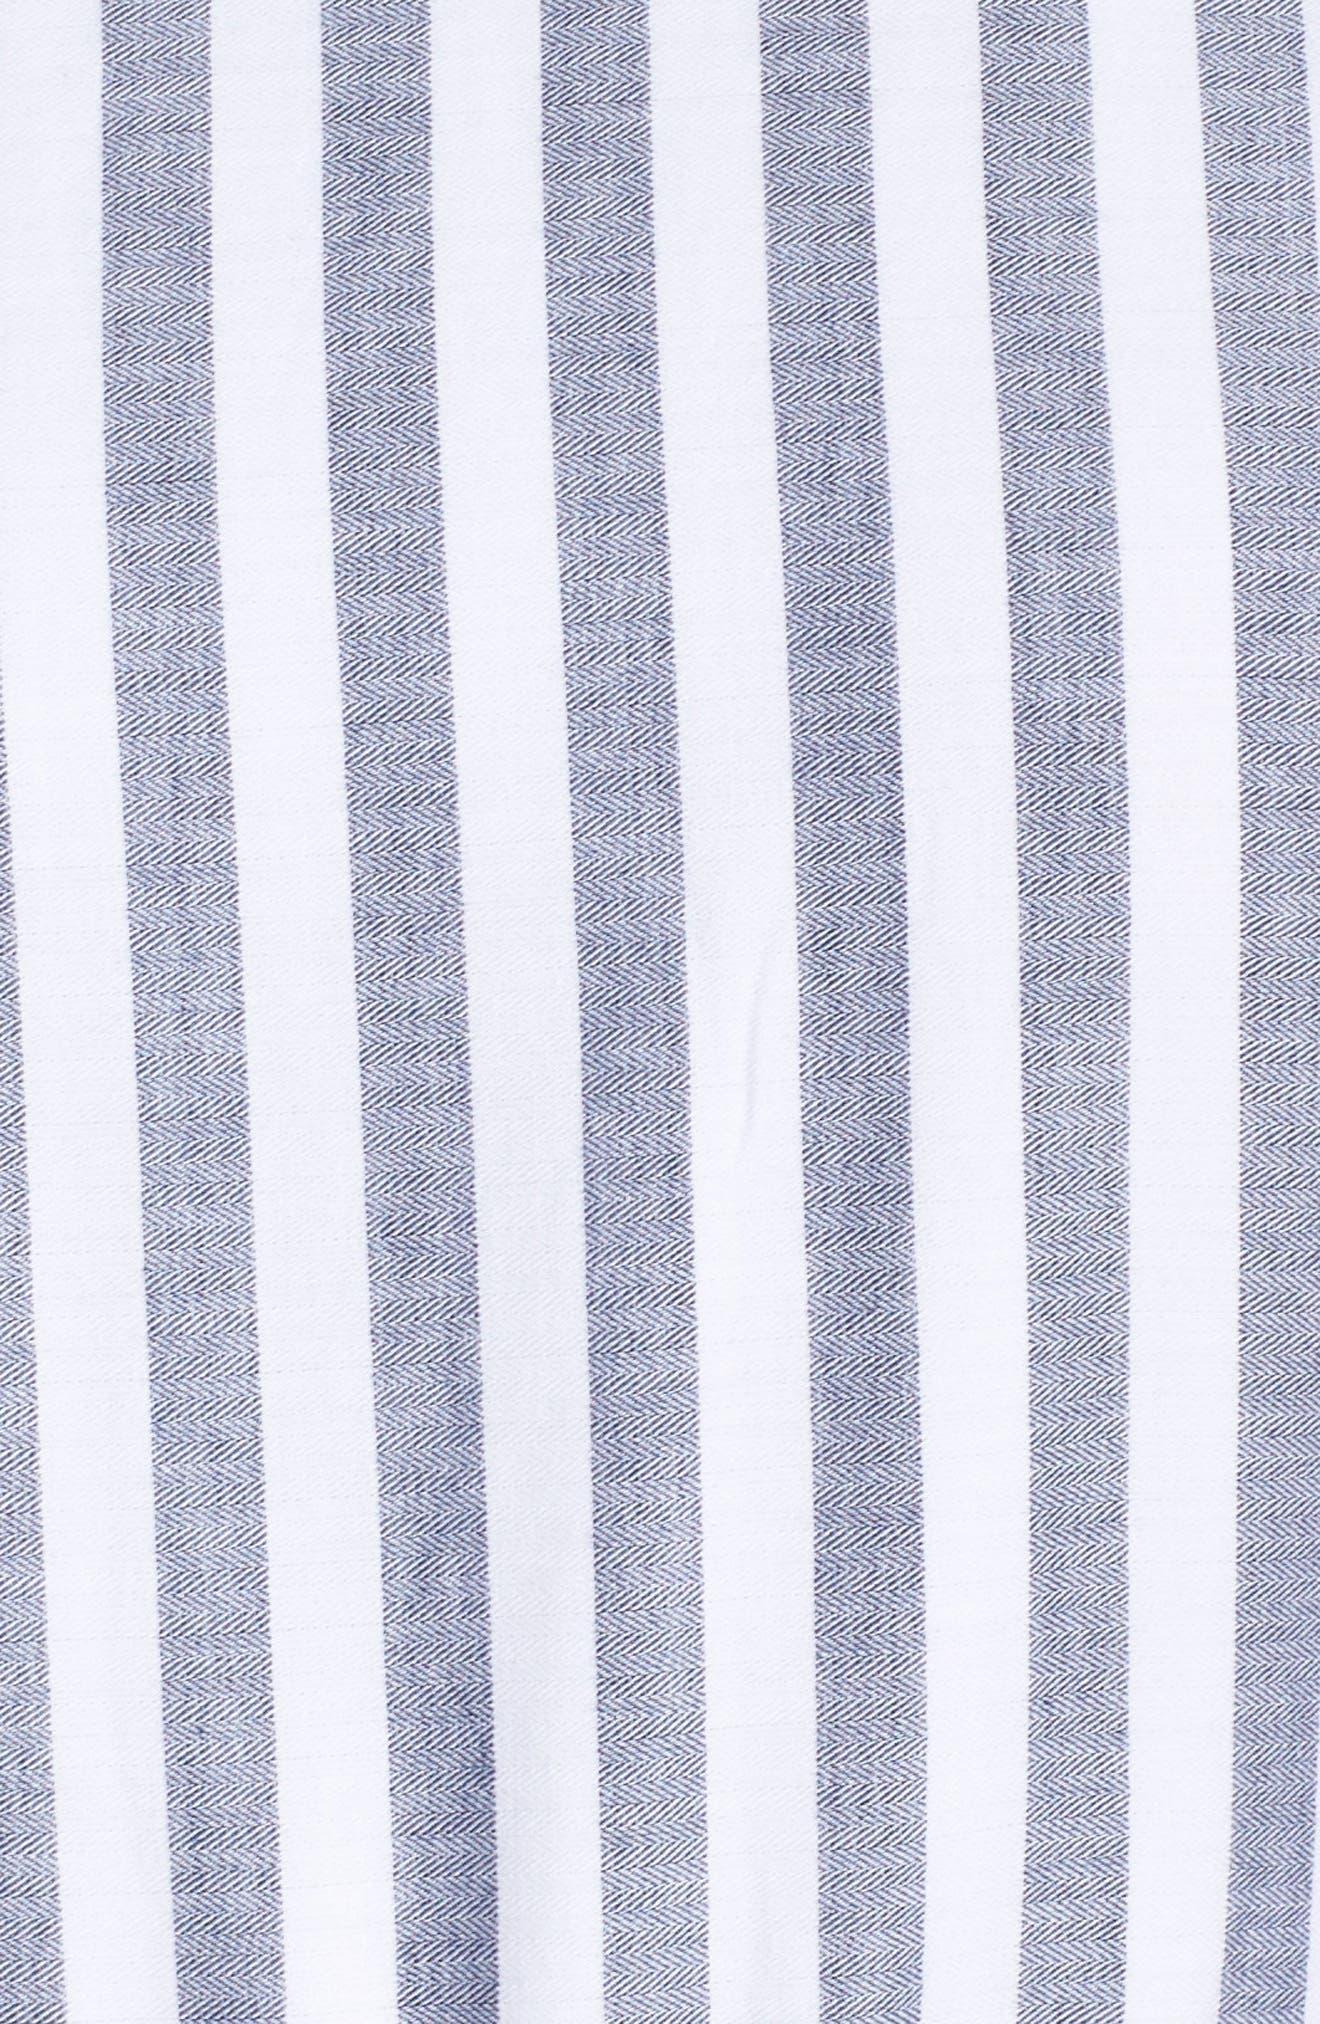 ELIZA J,                             Tiered Tassel Fringe Cotton Maxi Dress,                             Alternate thumbnail 6, color,                             IVORY/ GREY